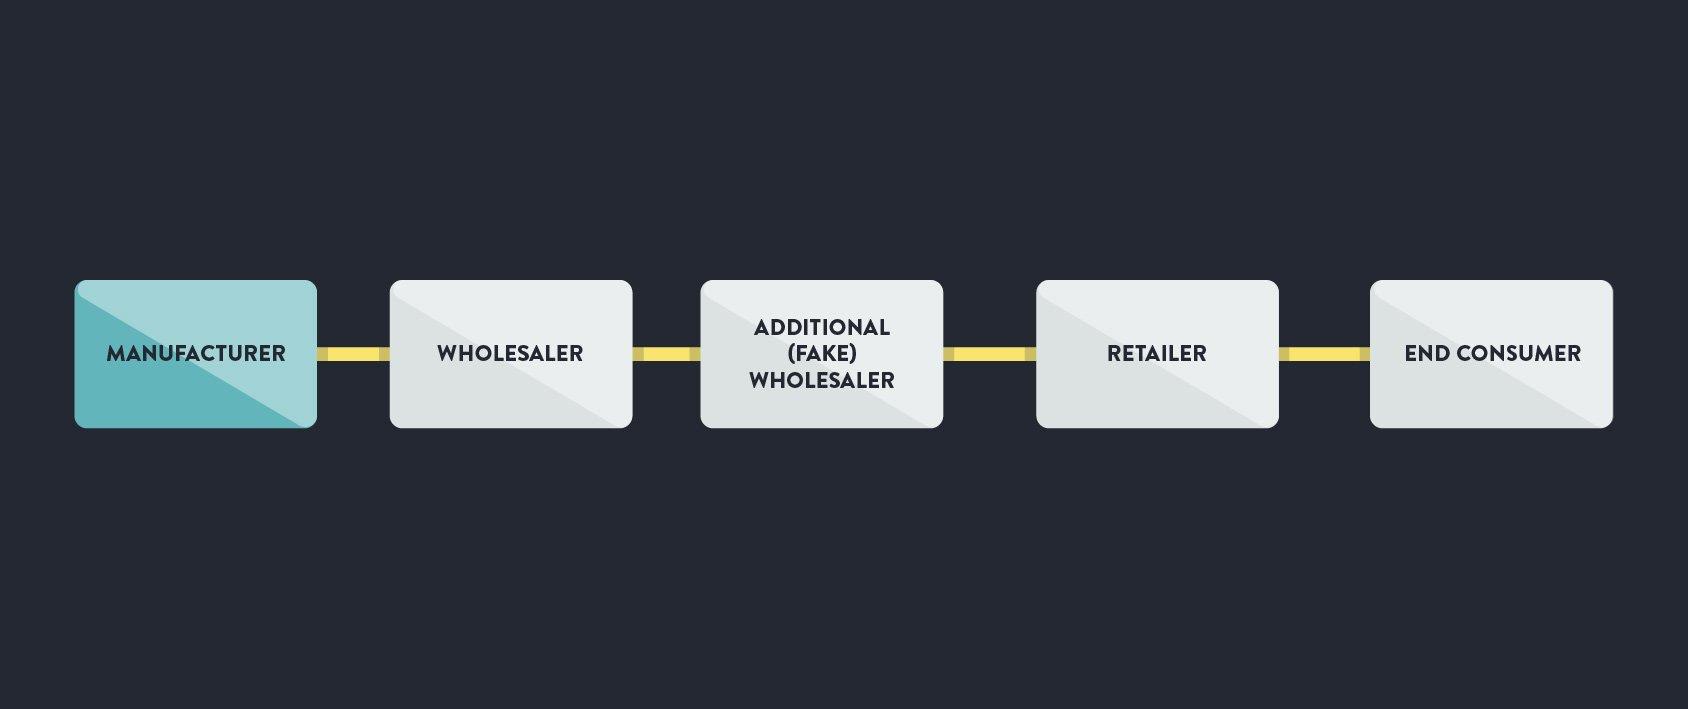 Drop Shipping Spreadsheet Pertaining To Finding Drop Shipping Companies + Free Directory